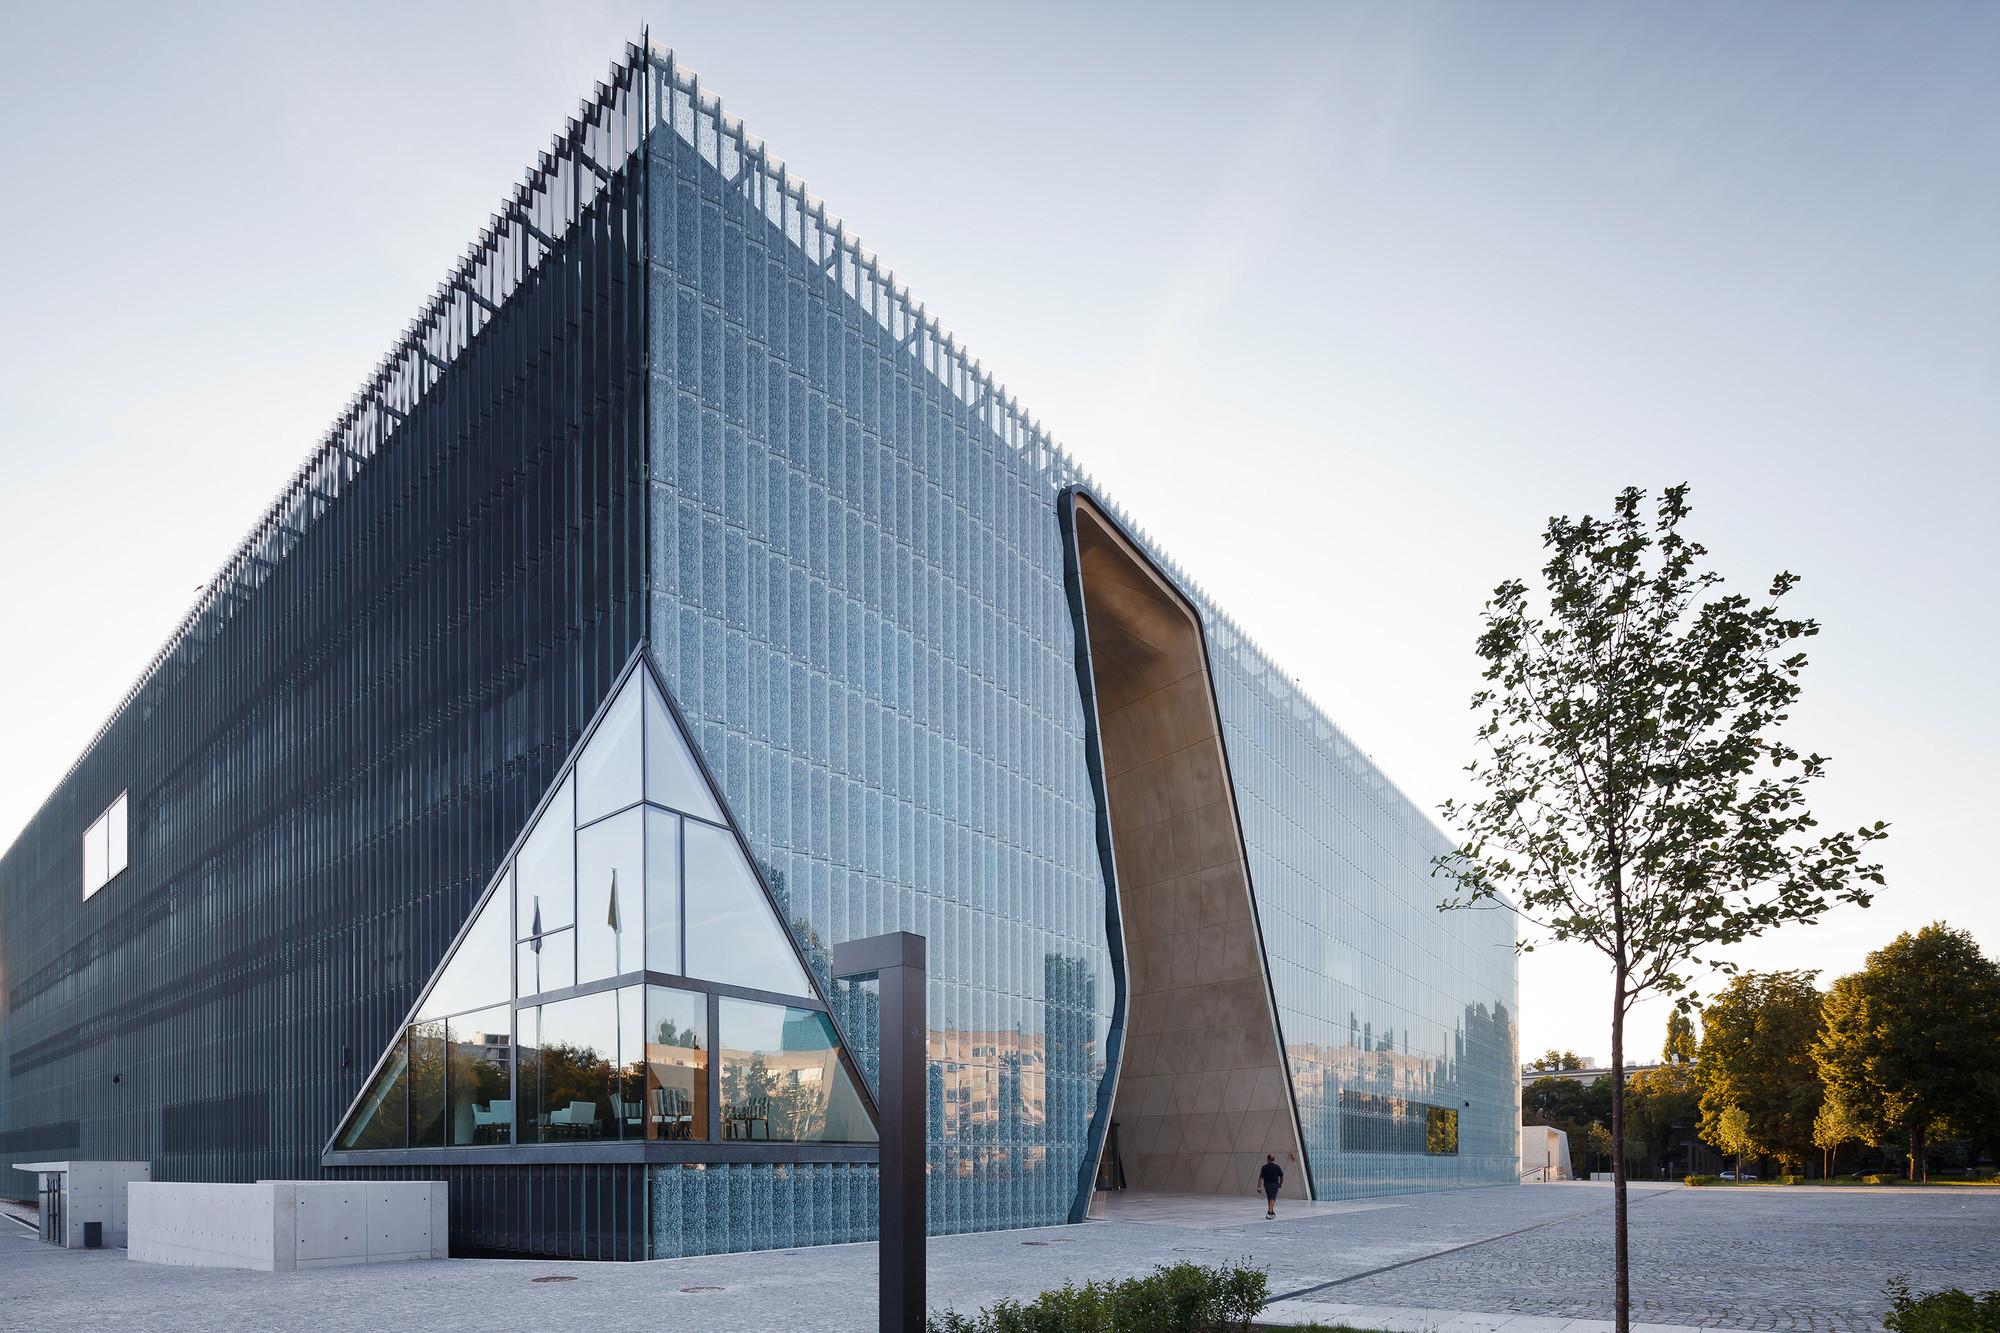 Museo de la historia Judio-Polaca / Lahdelma & Mahlamäki + Kuryłowicz & Associates. Imágen © Pawel Paniczko